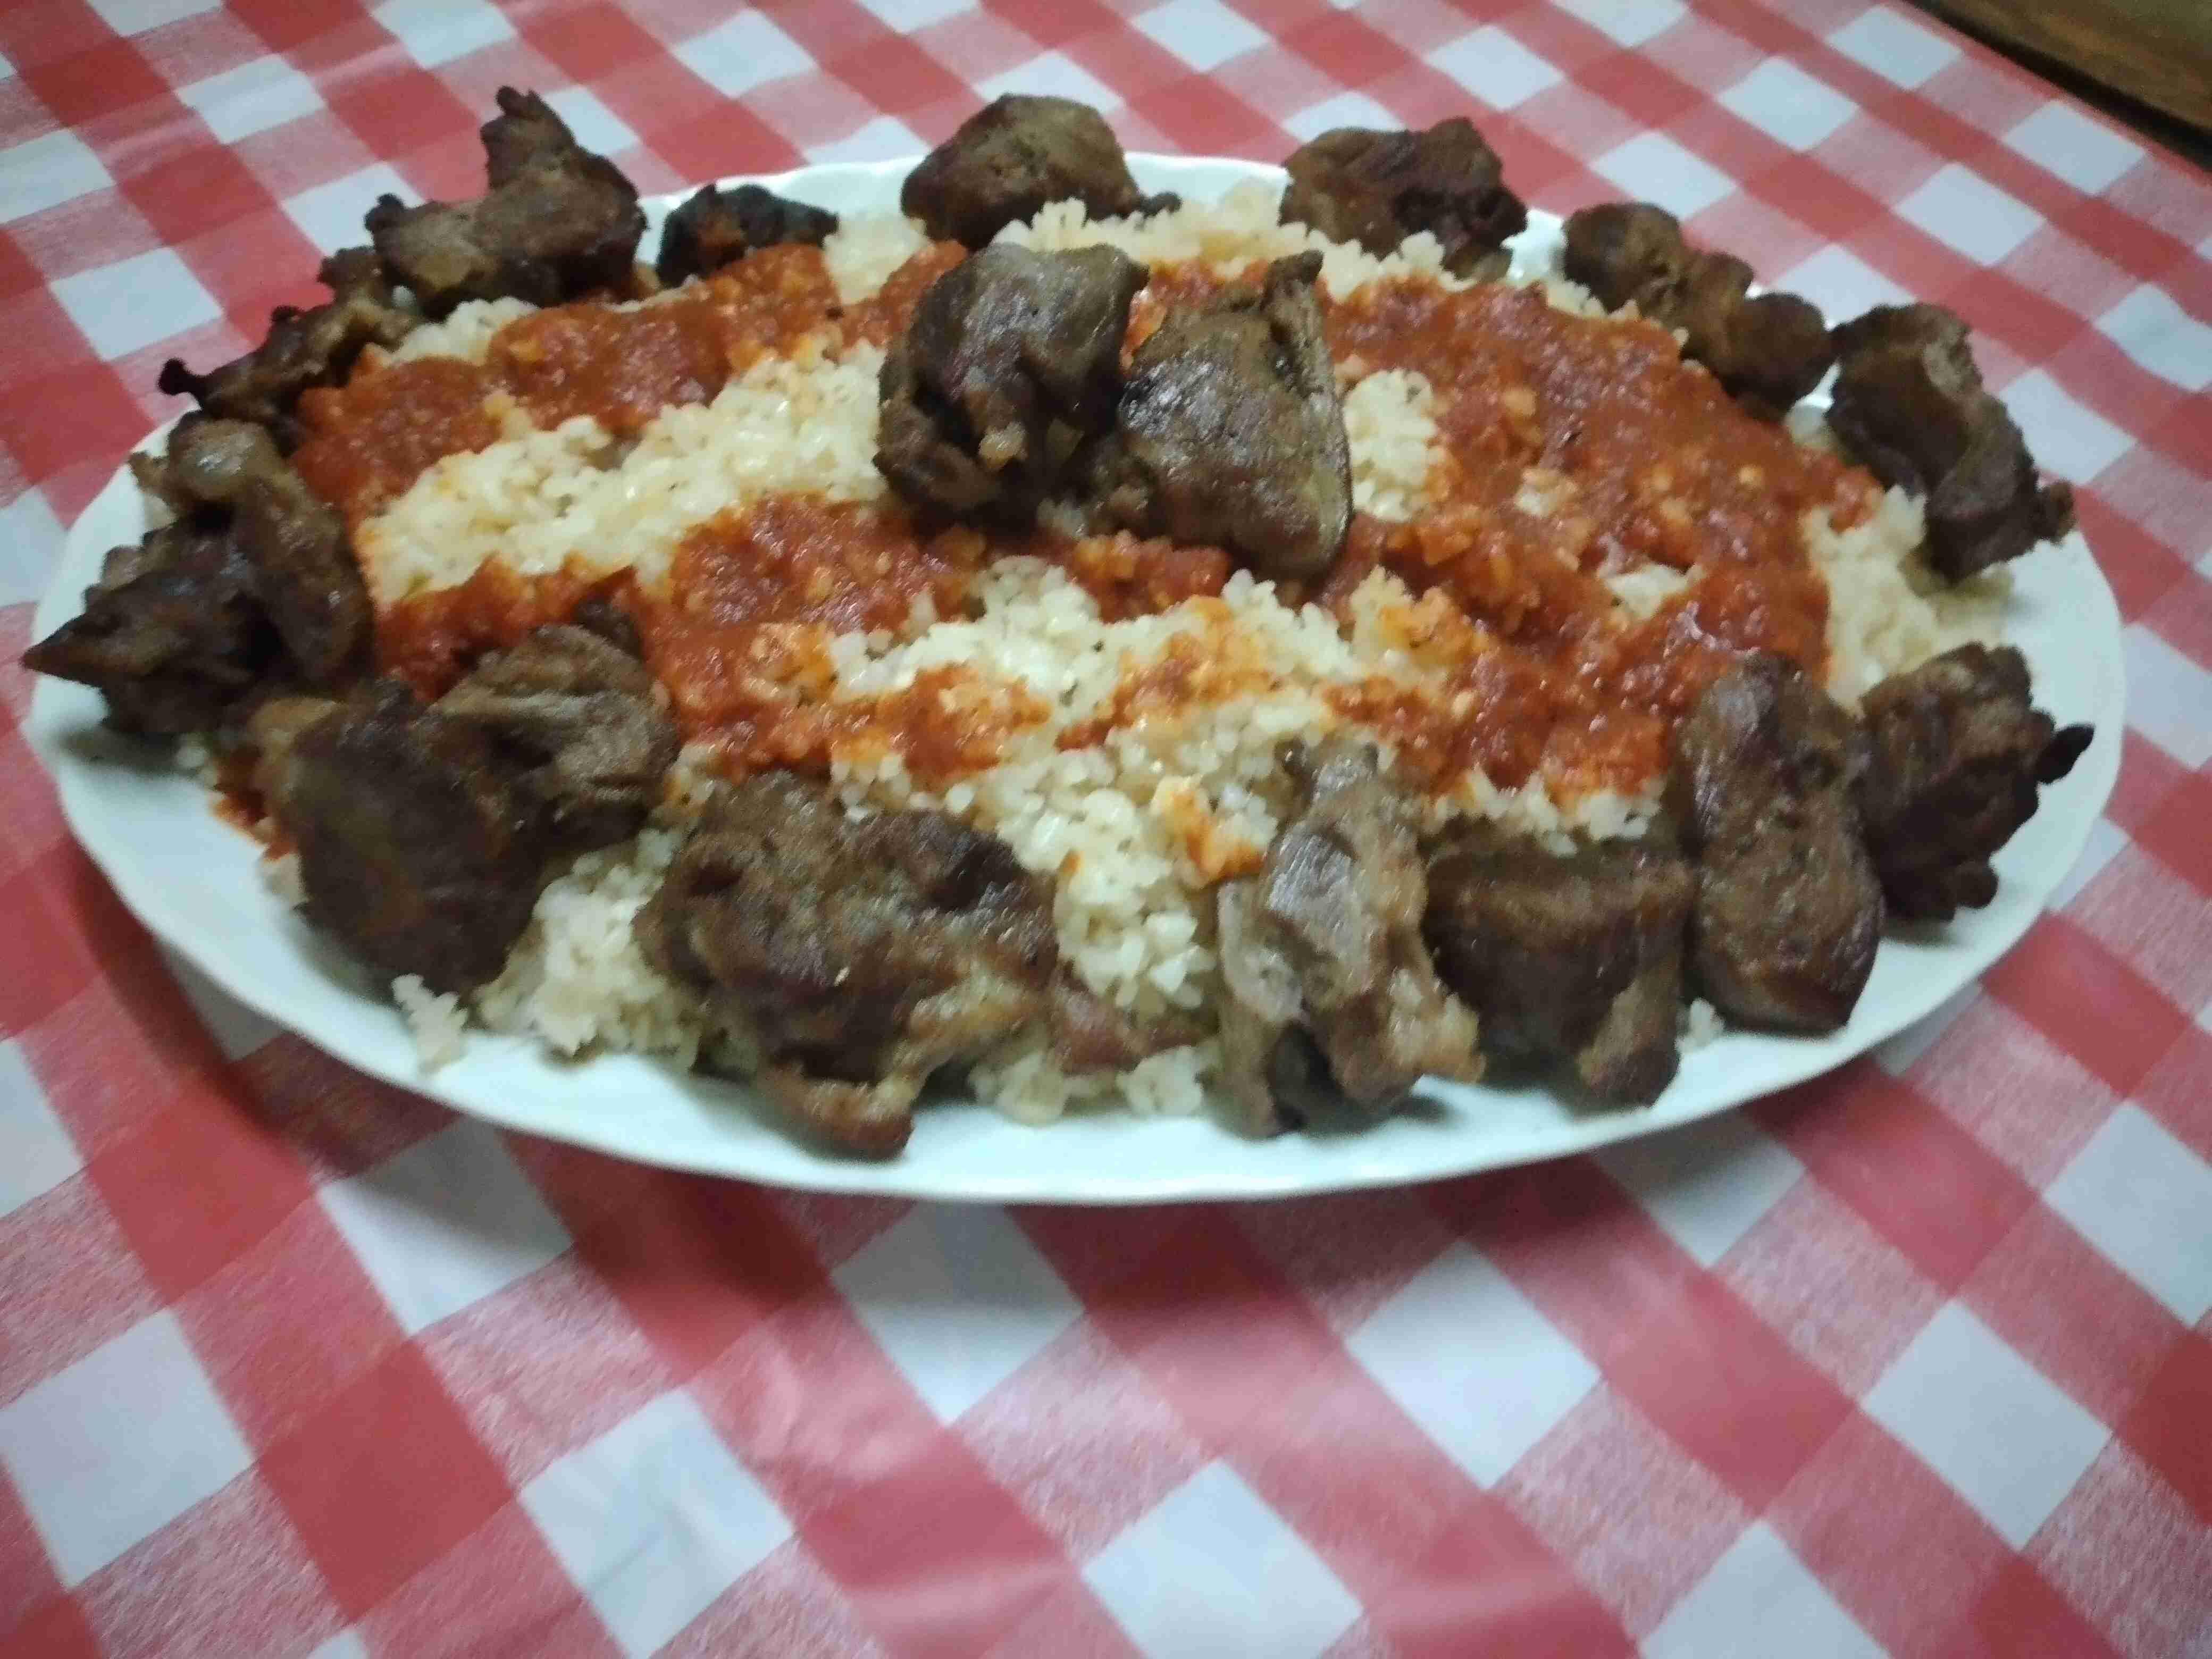 الفته المصريه زاكي Recipe Food Main Dishes Dishes